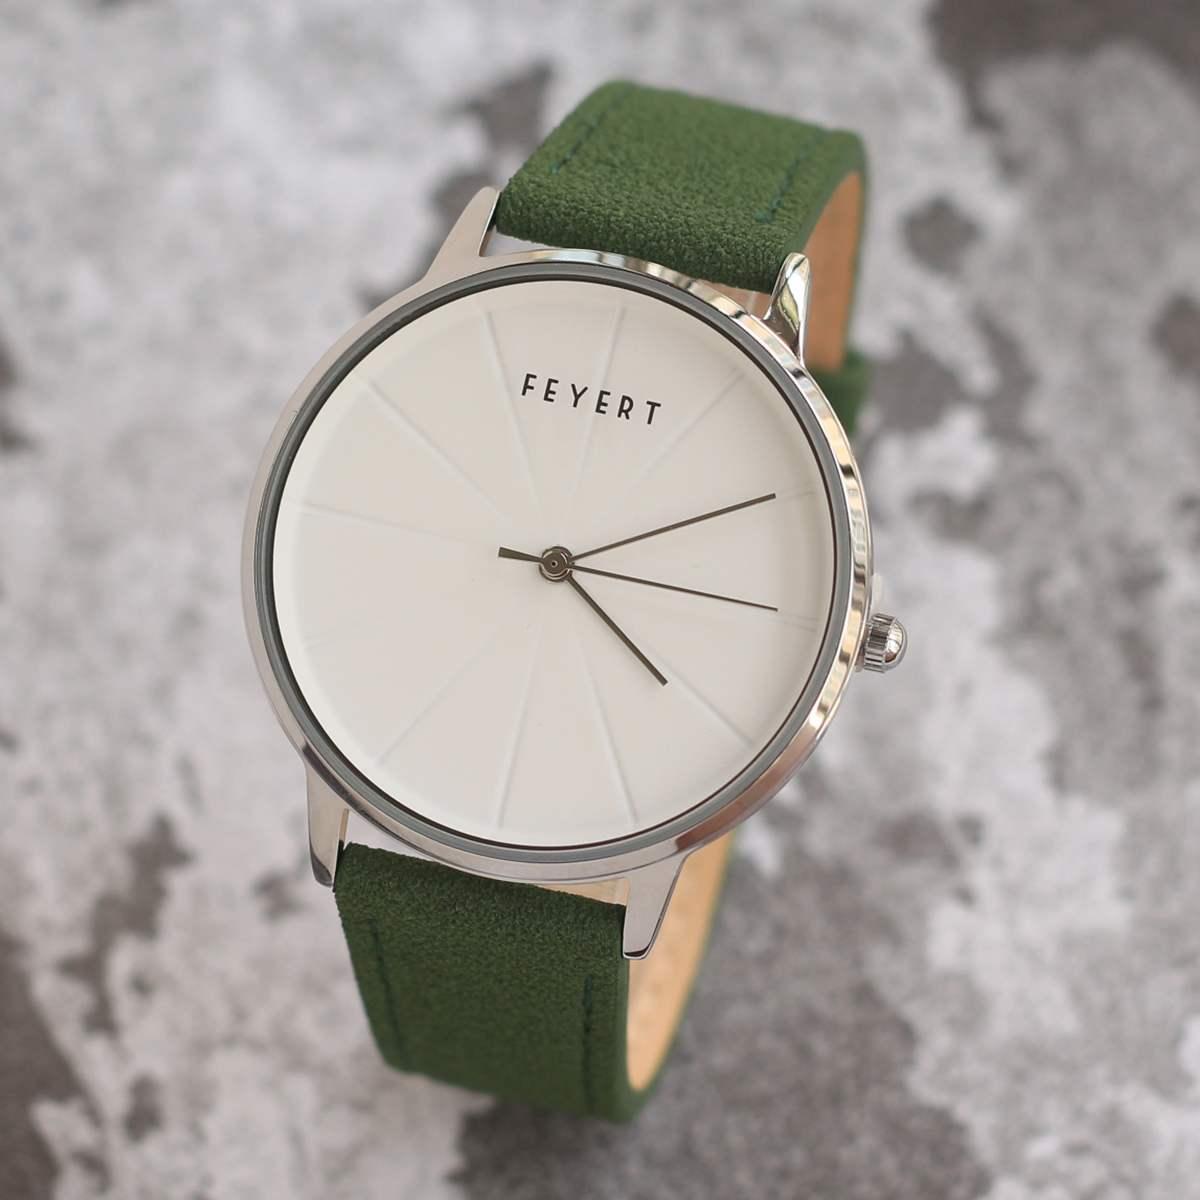 FEYESTヨーロッパの大衆ブランドの中性ファッションシンプルなデザインの男性と女性の大学生の腕時計です。